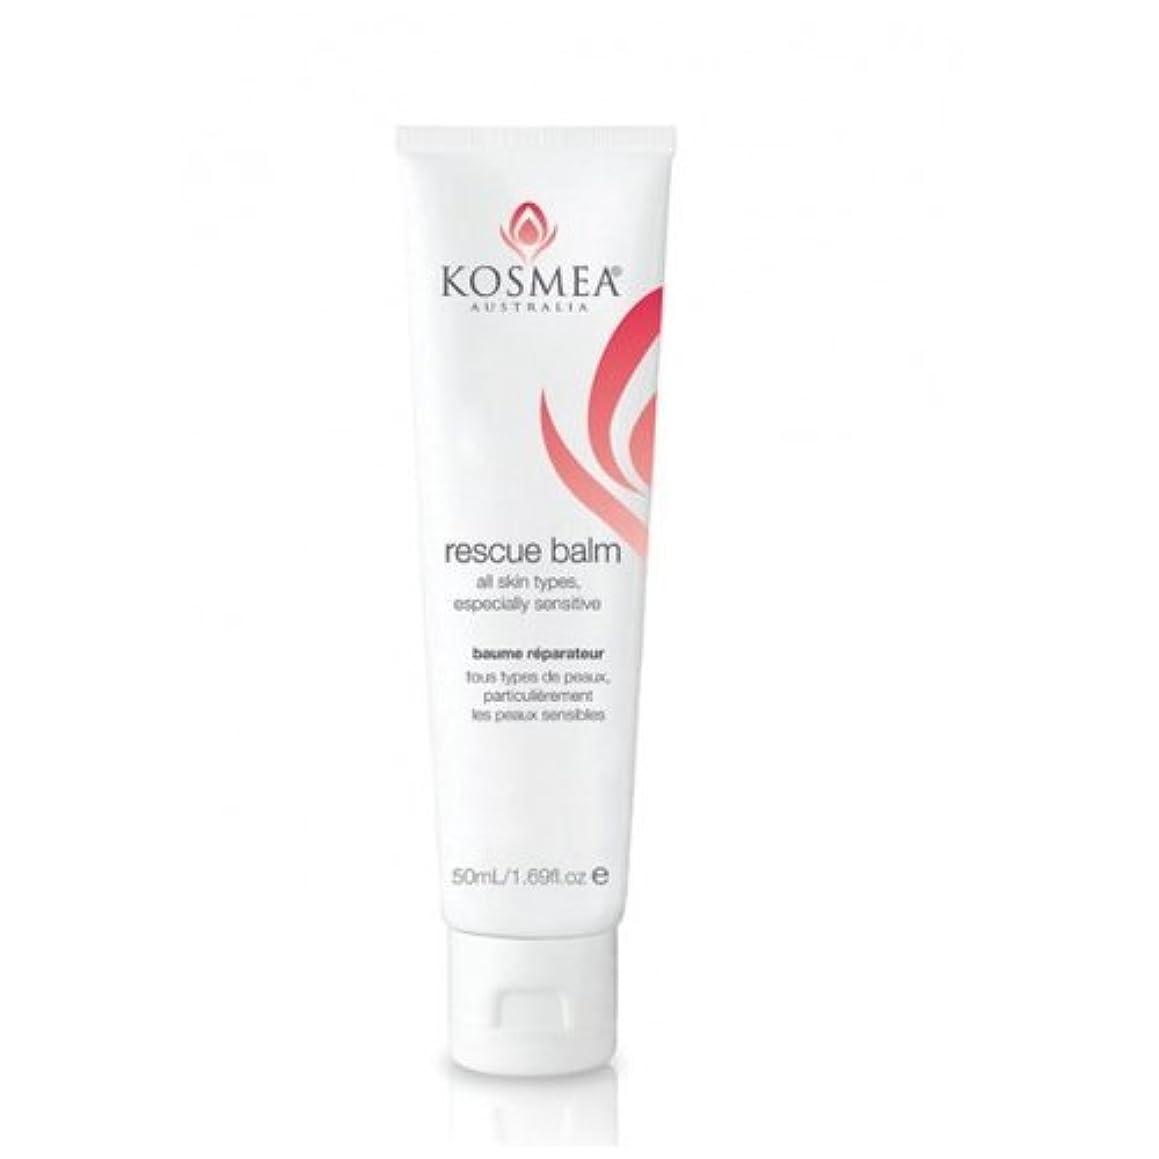 【KOSMEA】Skin Clinic TM Rescue Balm コスメア レスキューバーム 50ml【並行輸入品】【海外直送品】